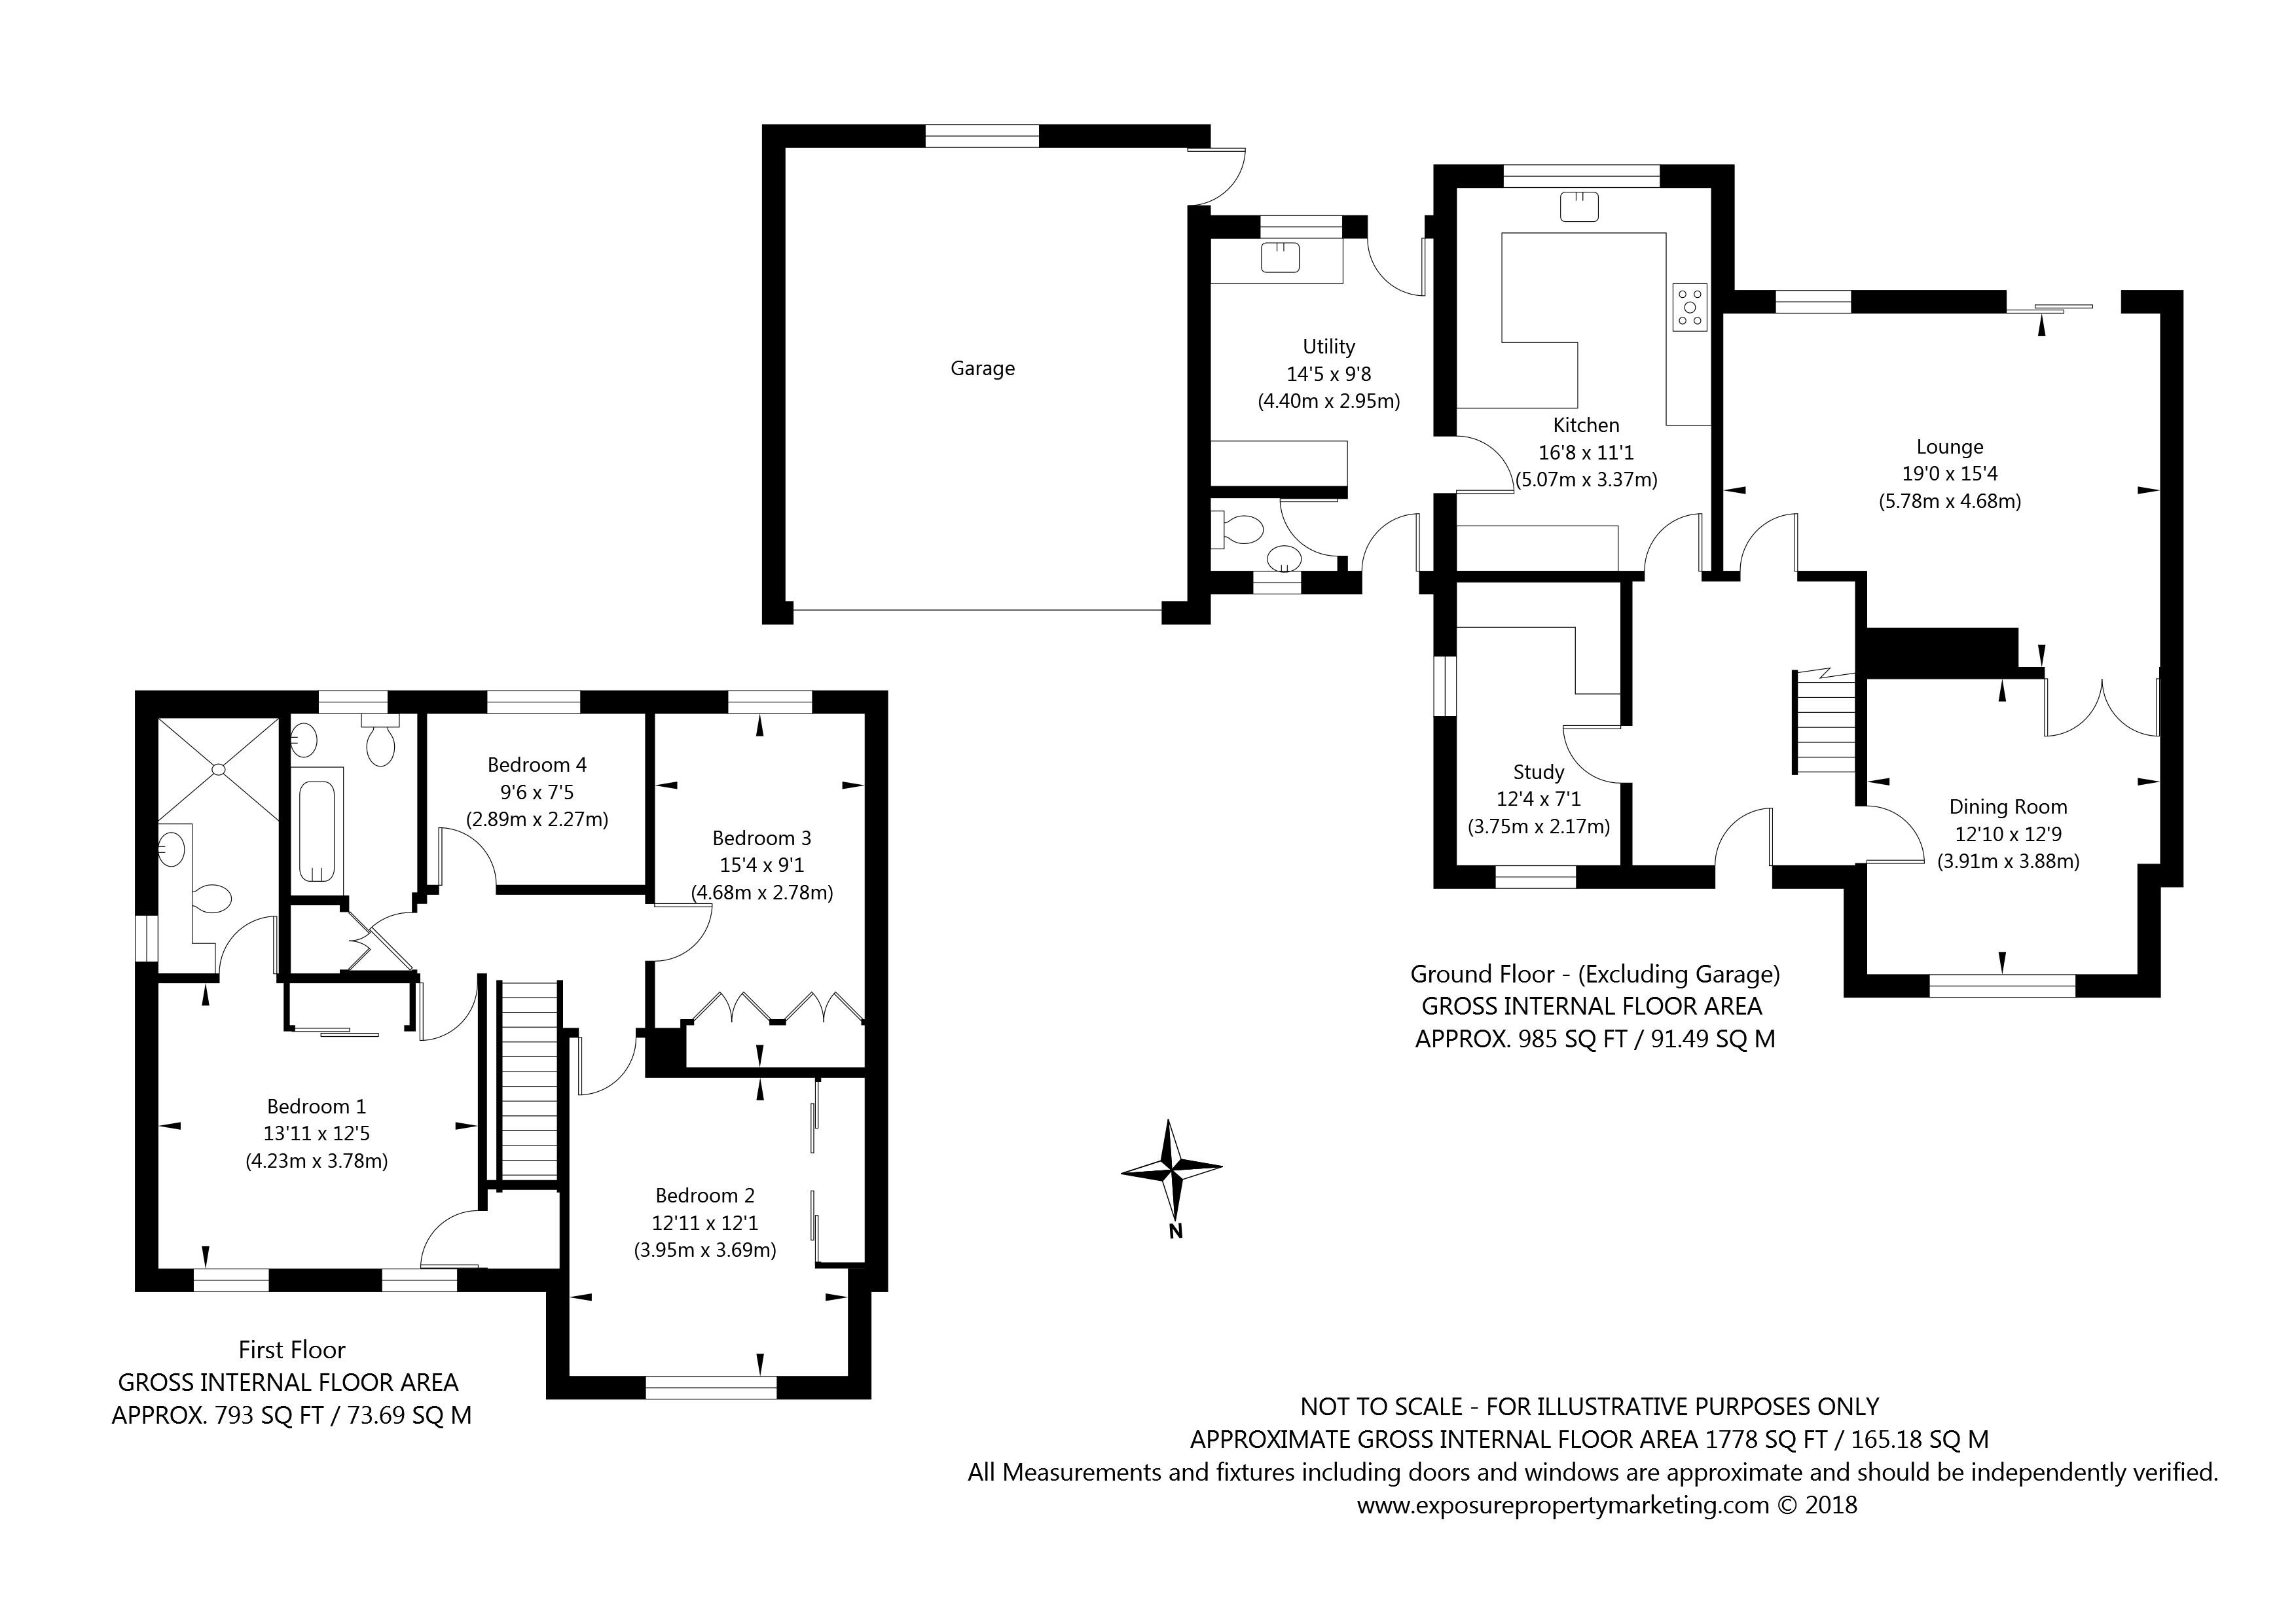 5 Newton Farm Court, Sutton on the Forest, York property floorplan